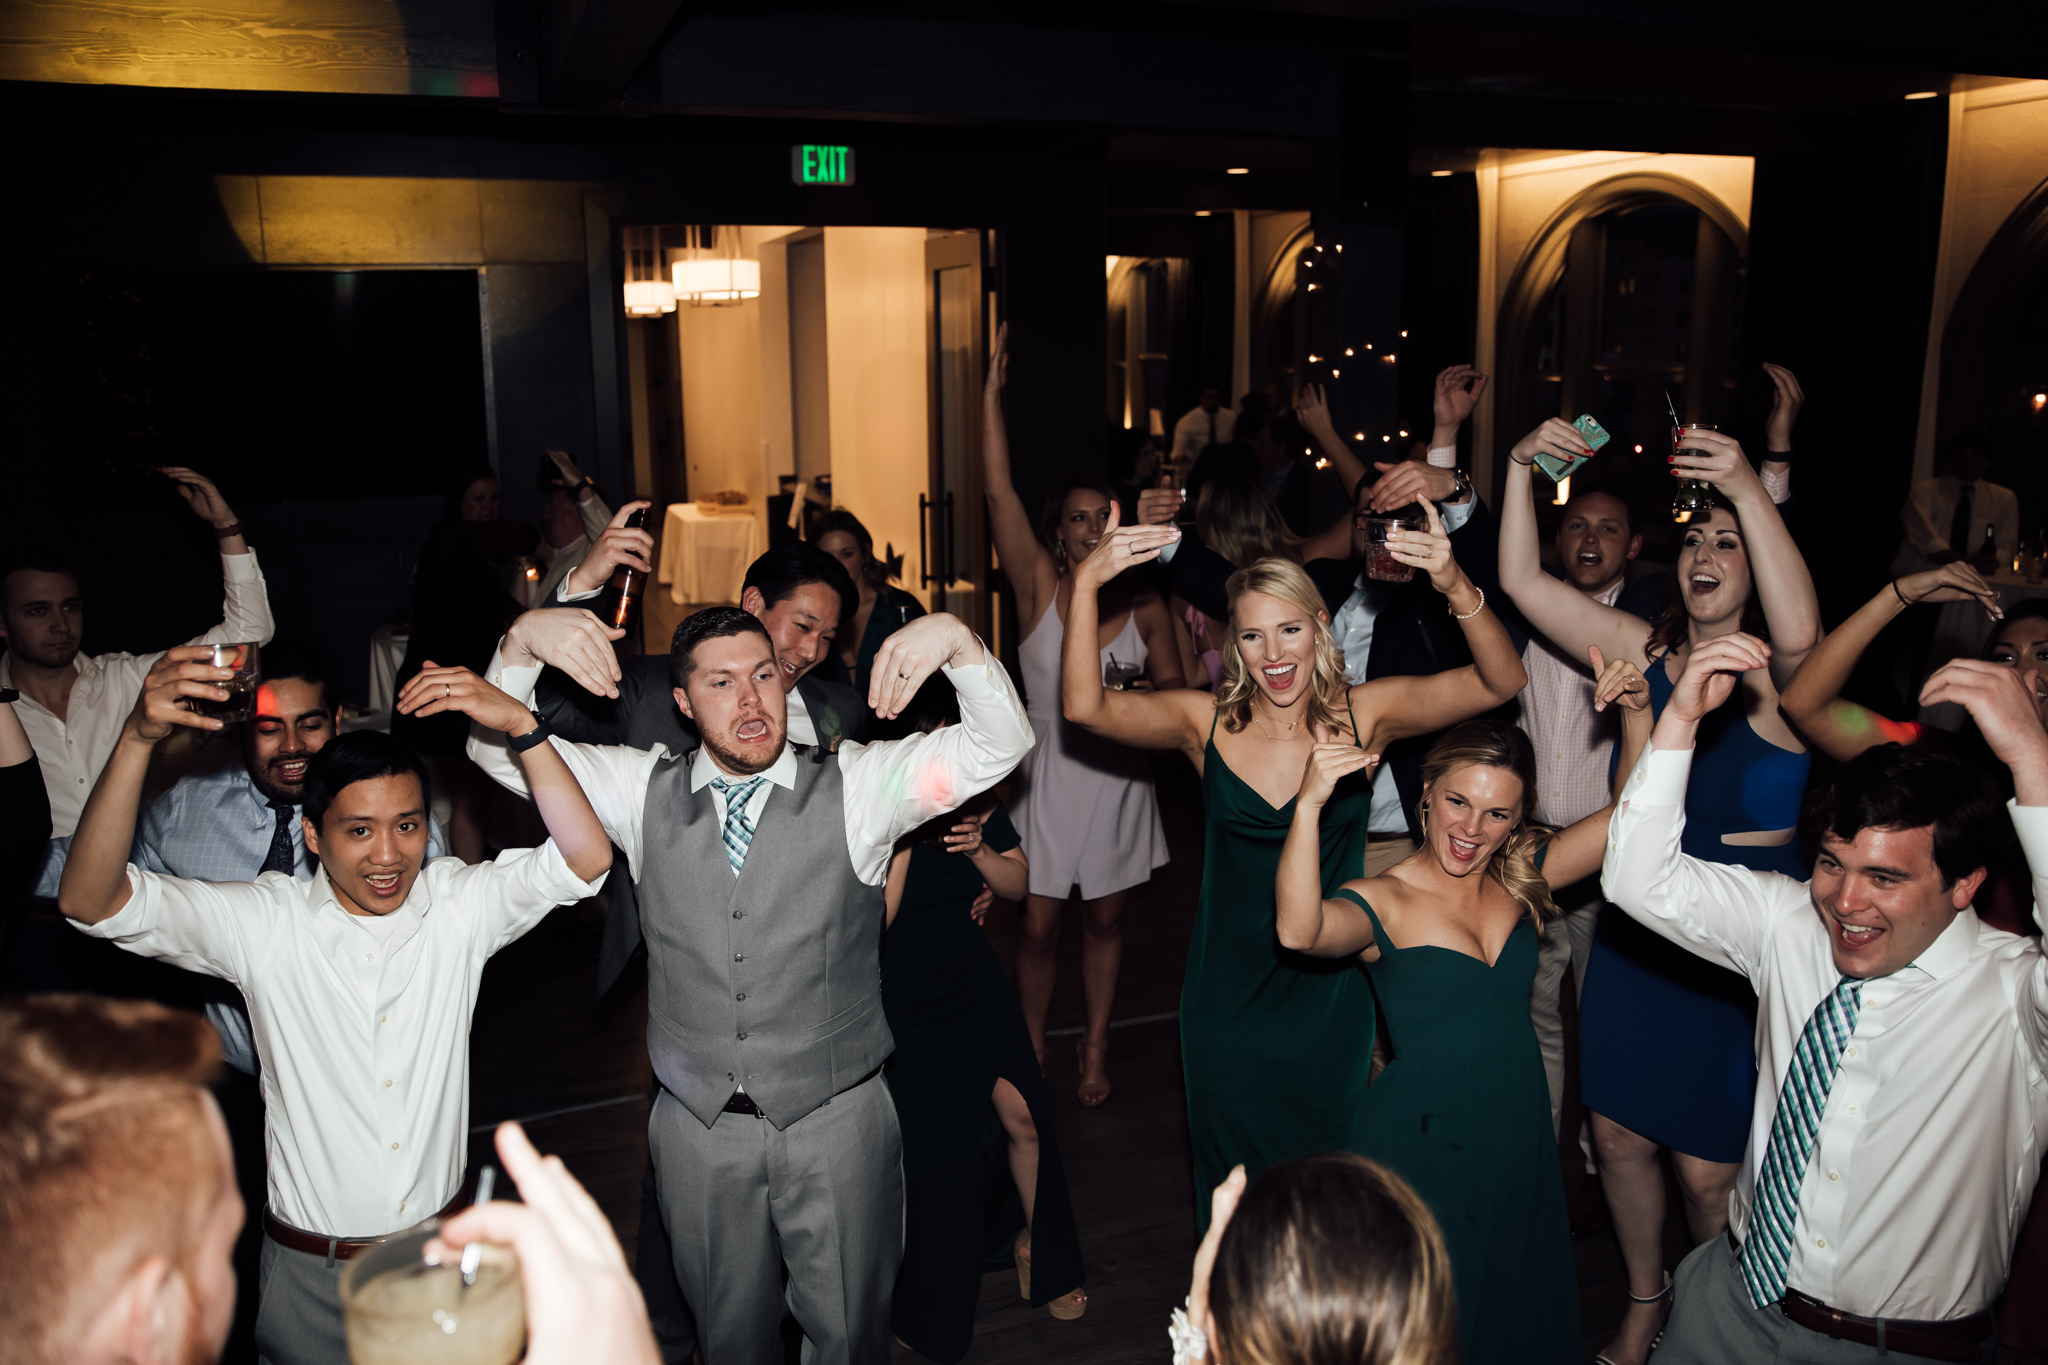 phantom-canyon-brewery-colorado-springs-wedding-photographer-13.jpg